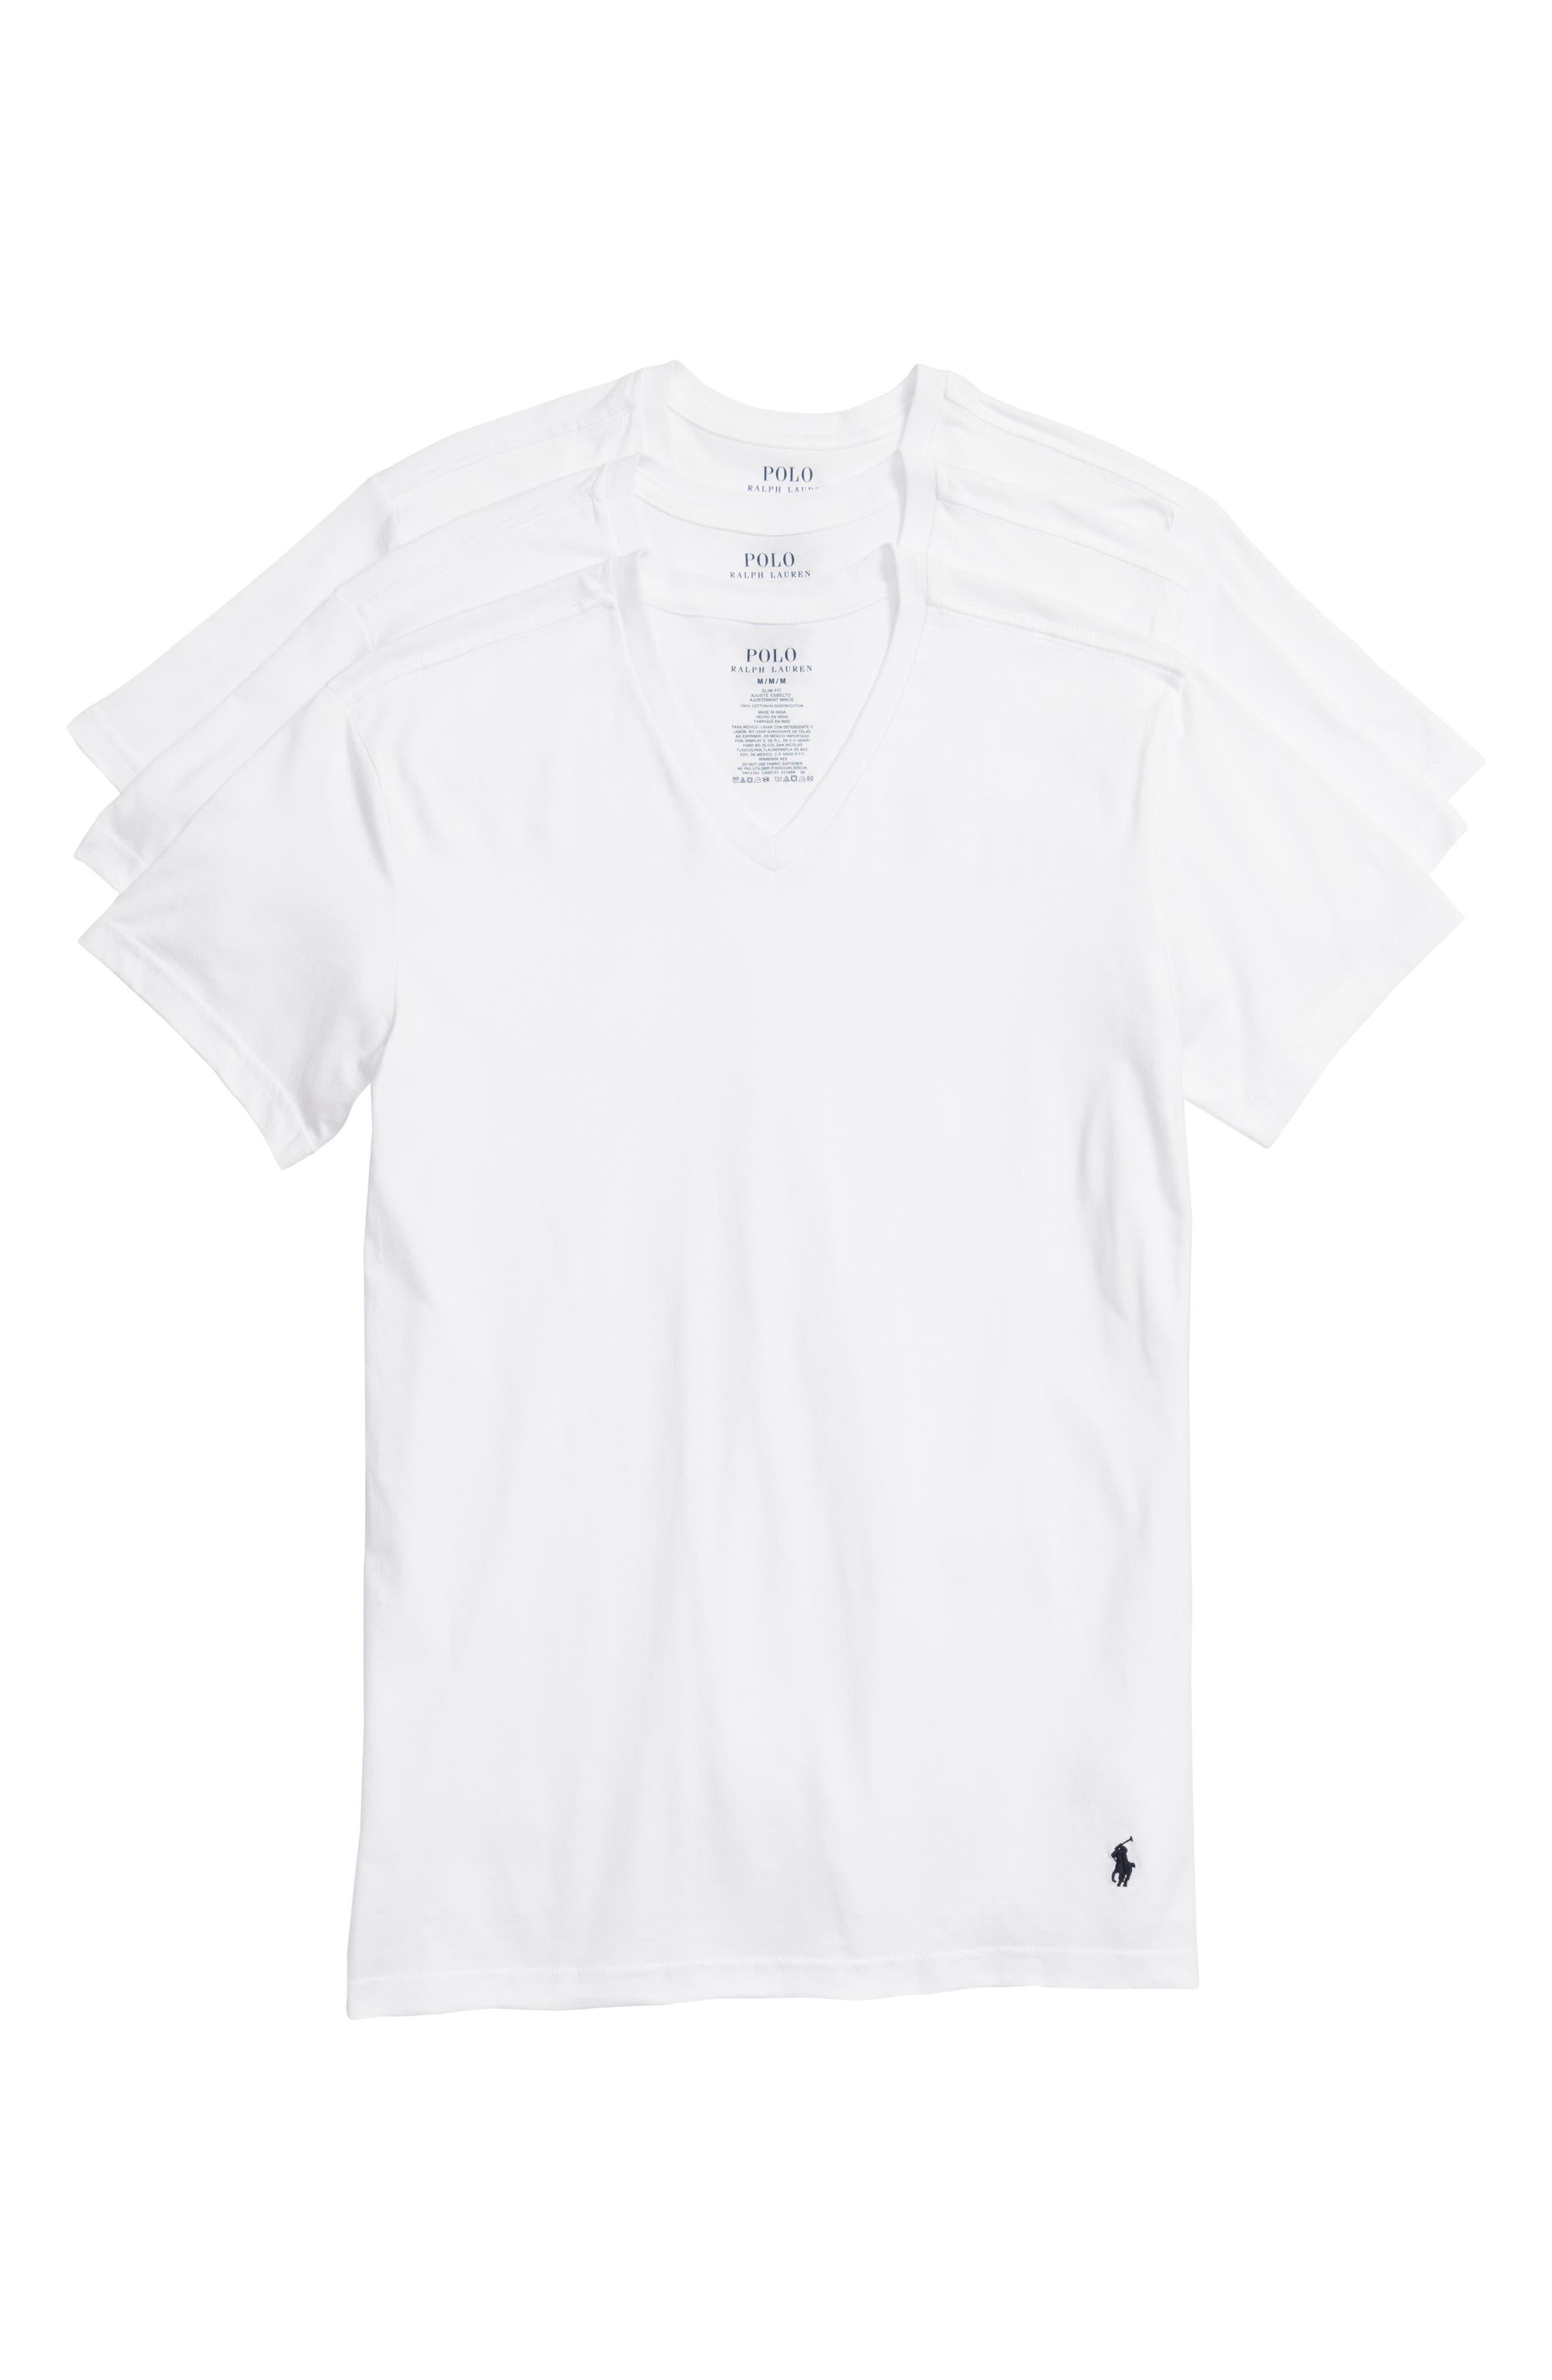 Polo Ralph Lauren 3-Pack Slim Fit V-Neck T-Shirts,                             Main thumbnail 1, color,                             WHITE